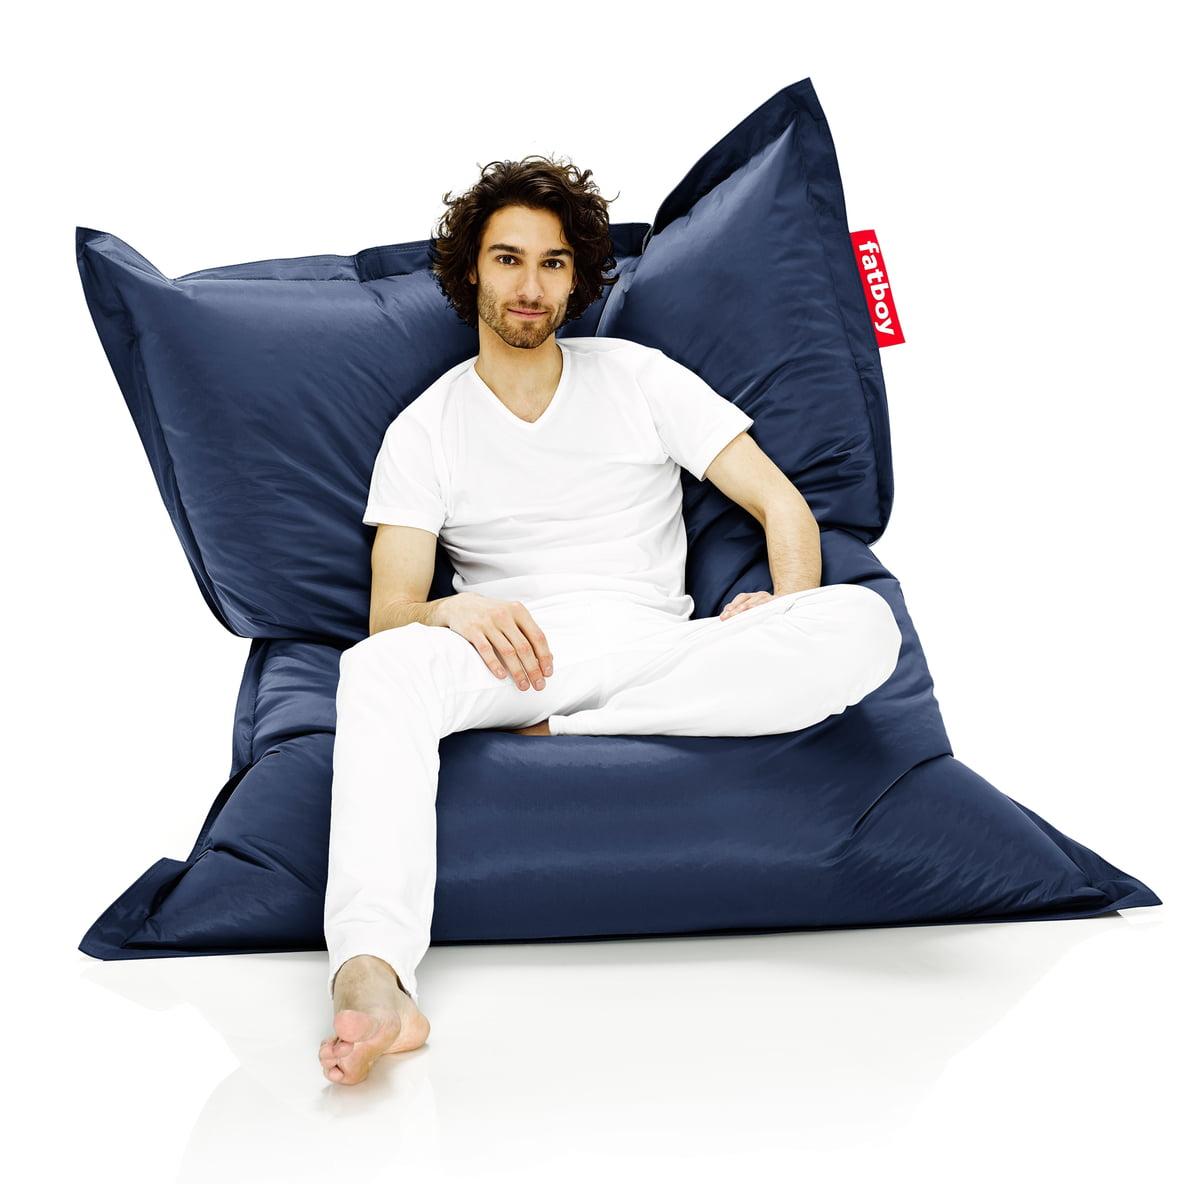 fatboy sitzsack original online kaufen. Black Bedroom Furniture Sets. Home Design Ideas